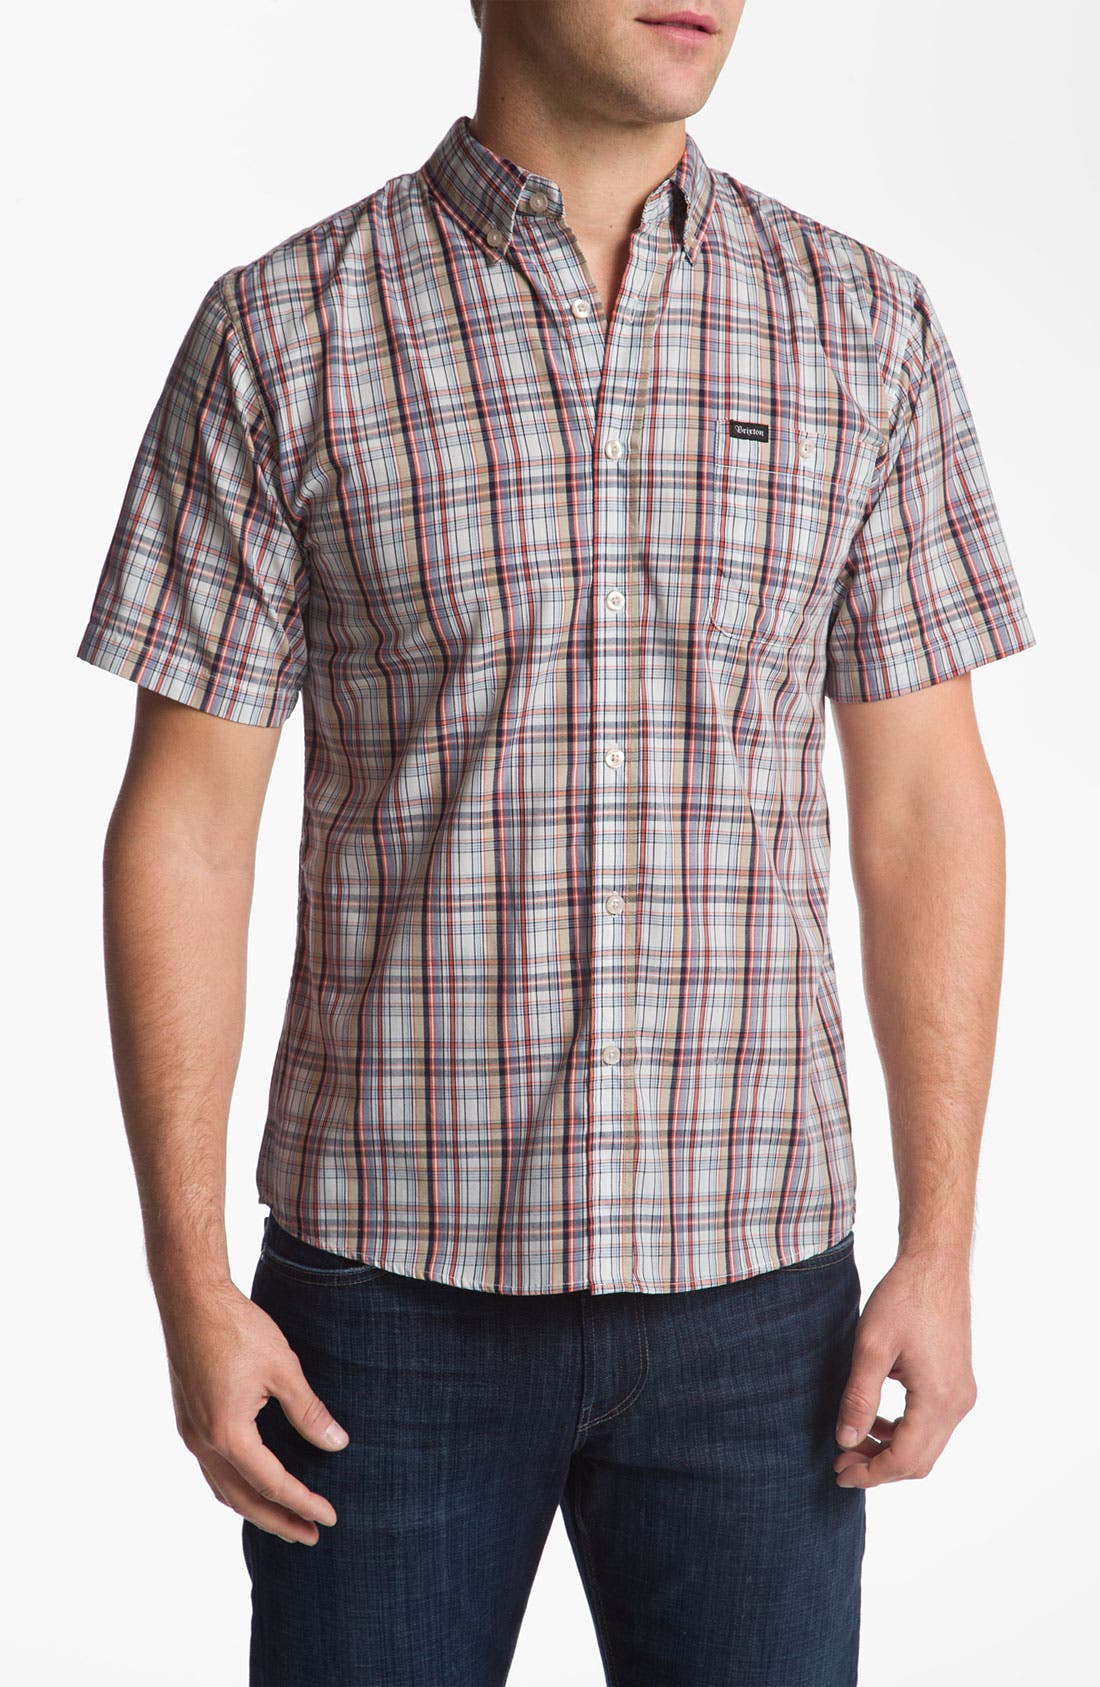 Alternate Image 1 Selected - Brixton 'Howl' Short Sleeve Woven Shirt